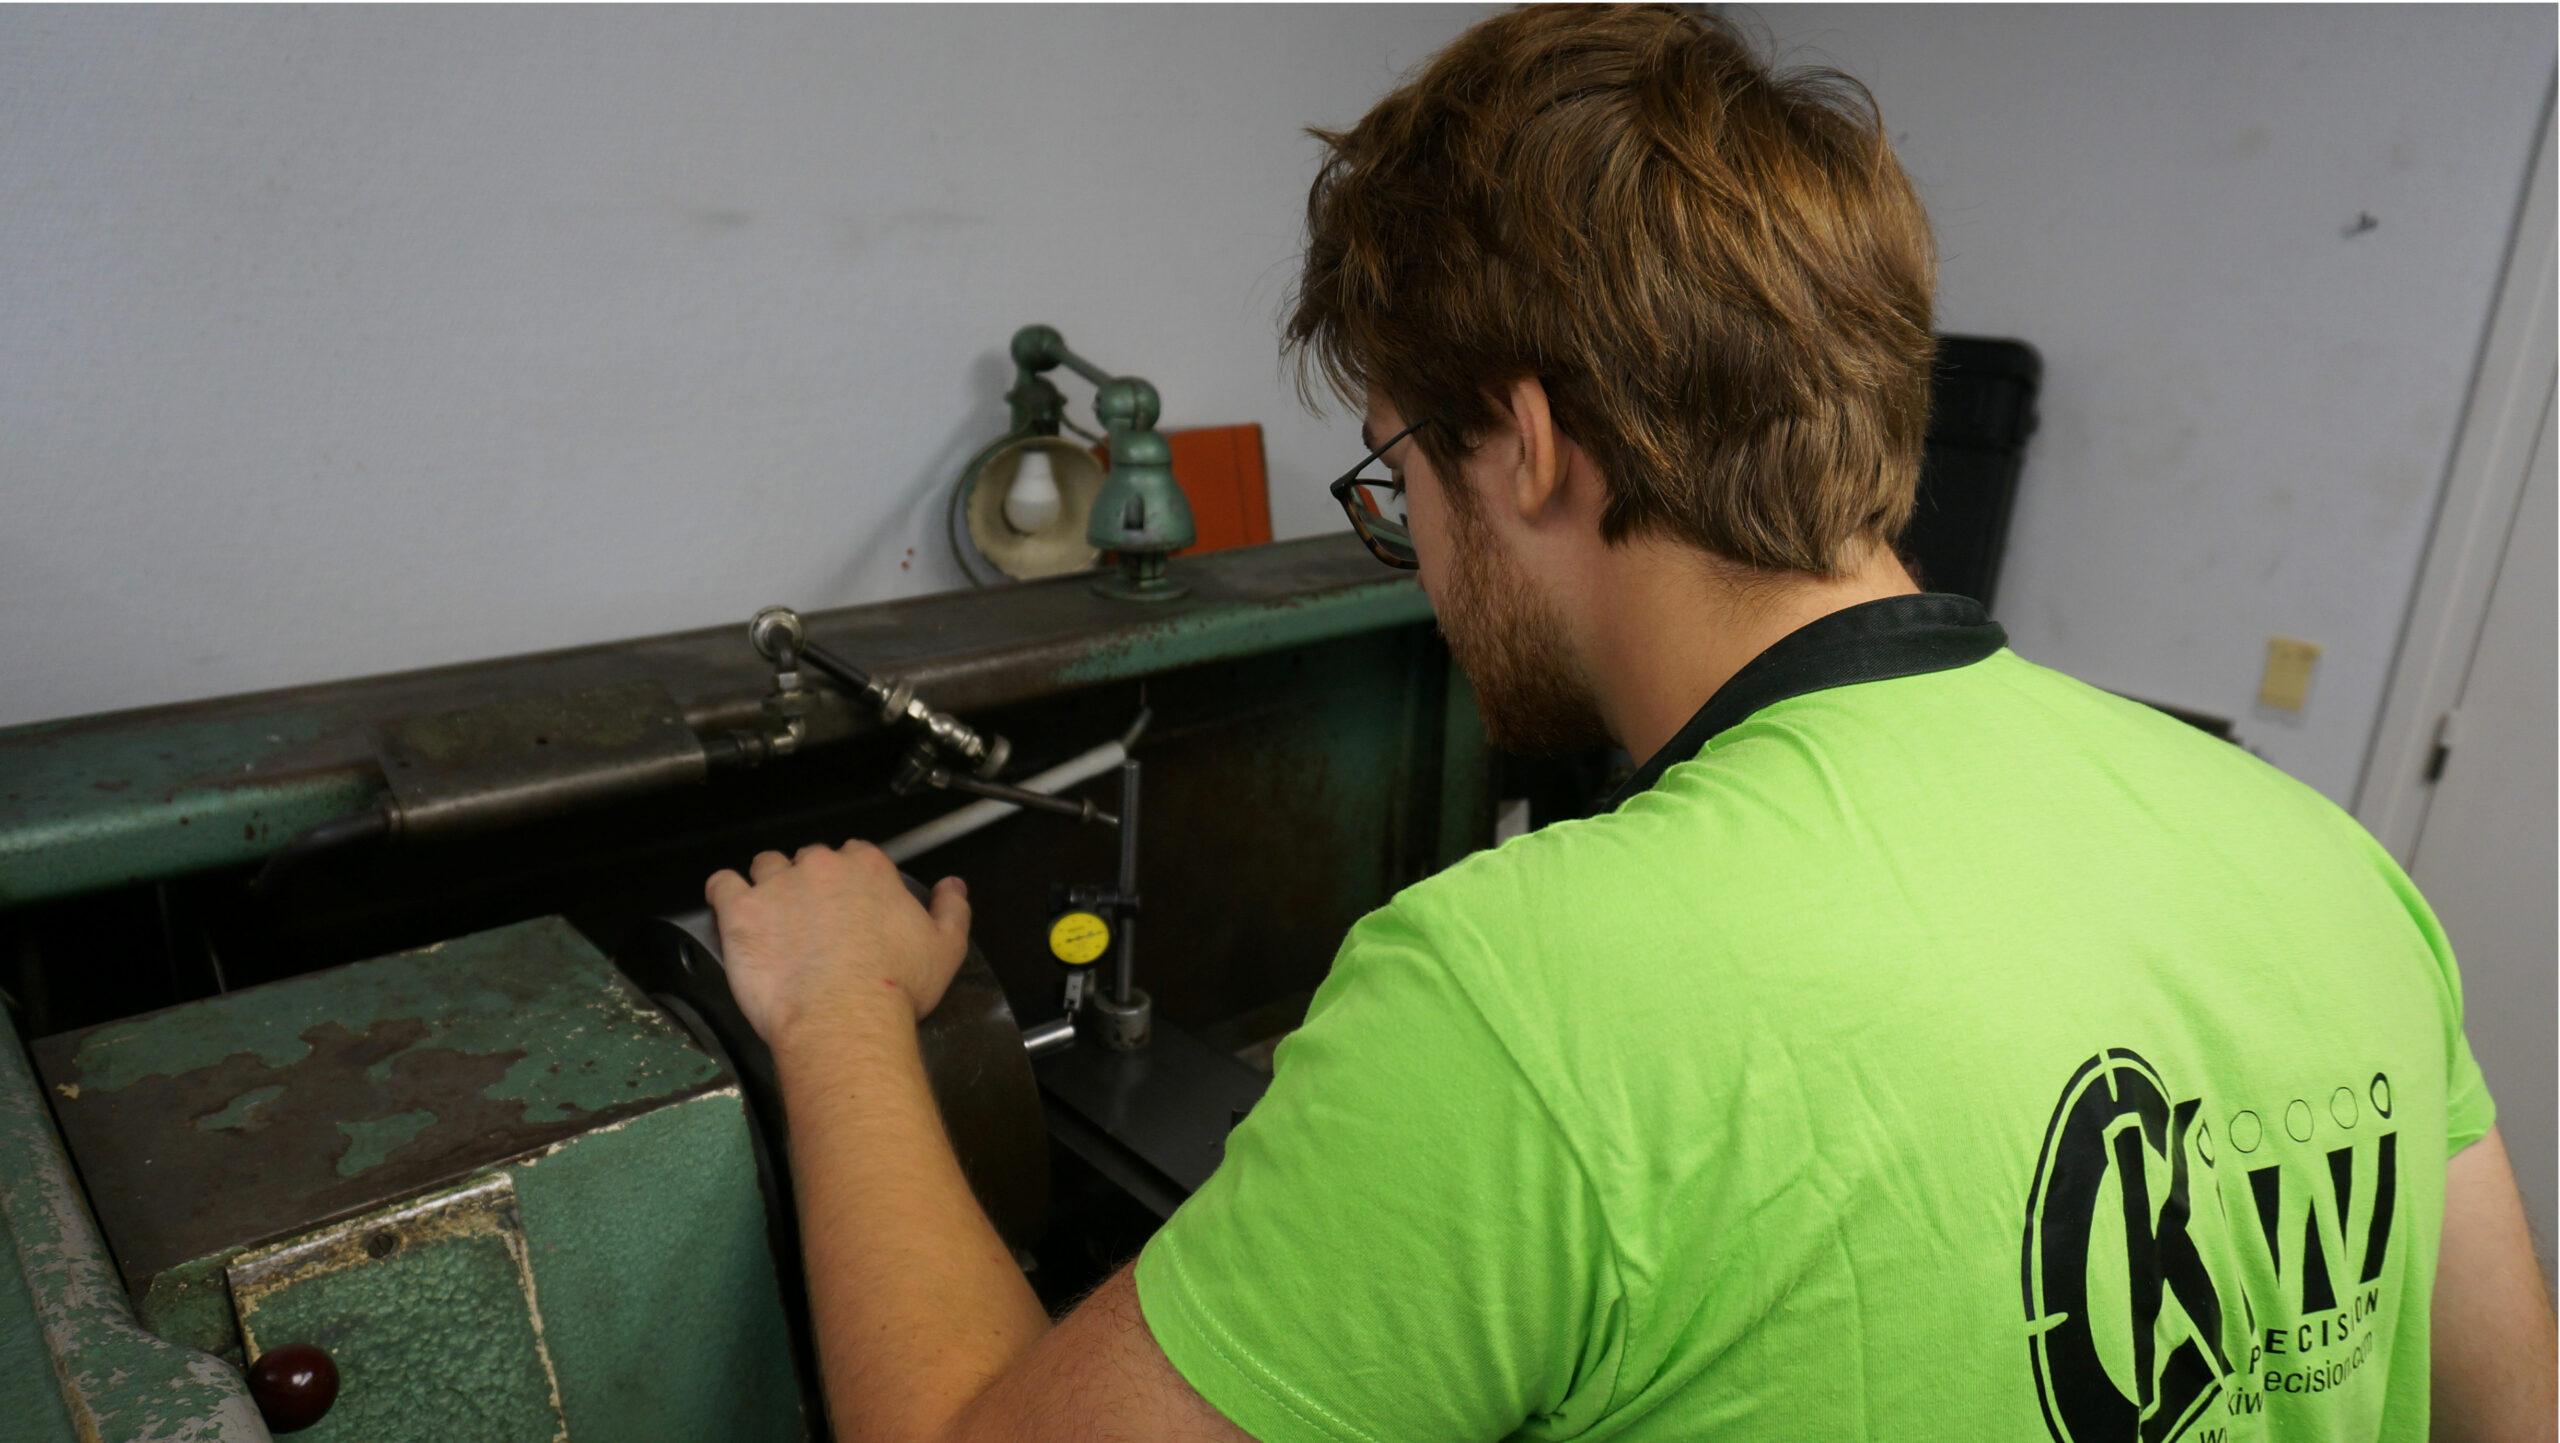 kiwi-précision-carabine-mfnf